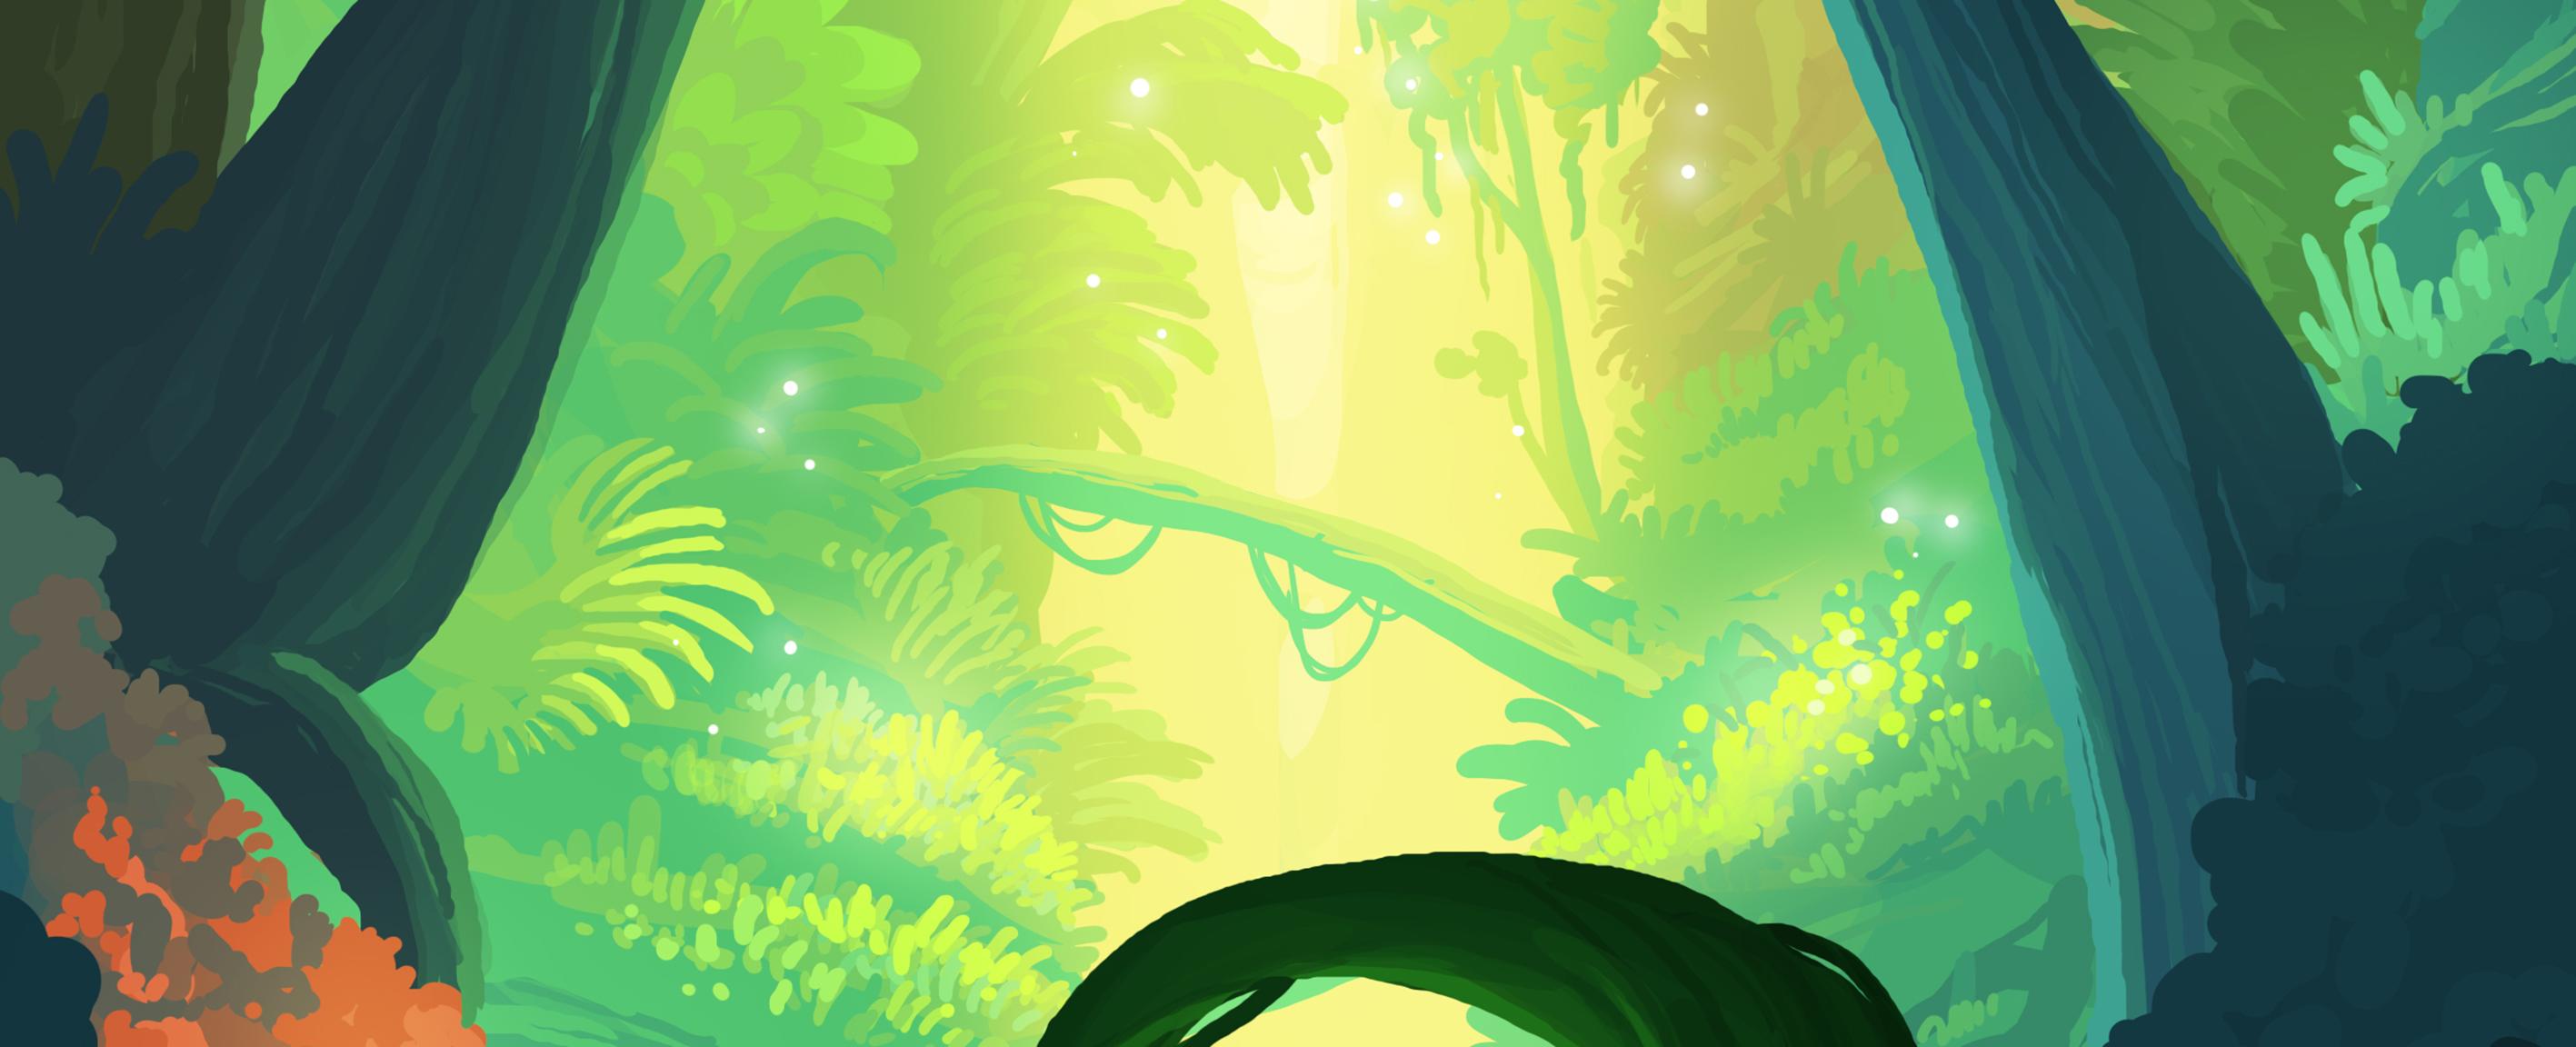 banner_forest